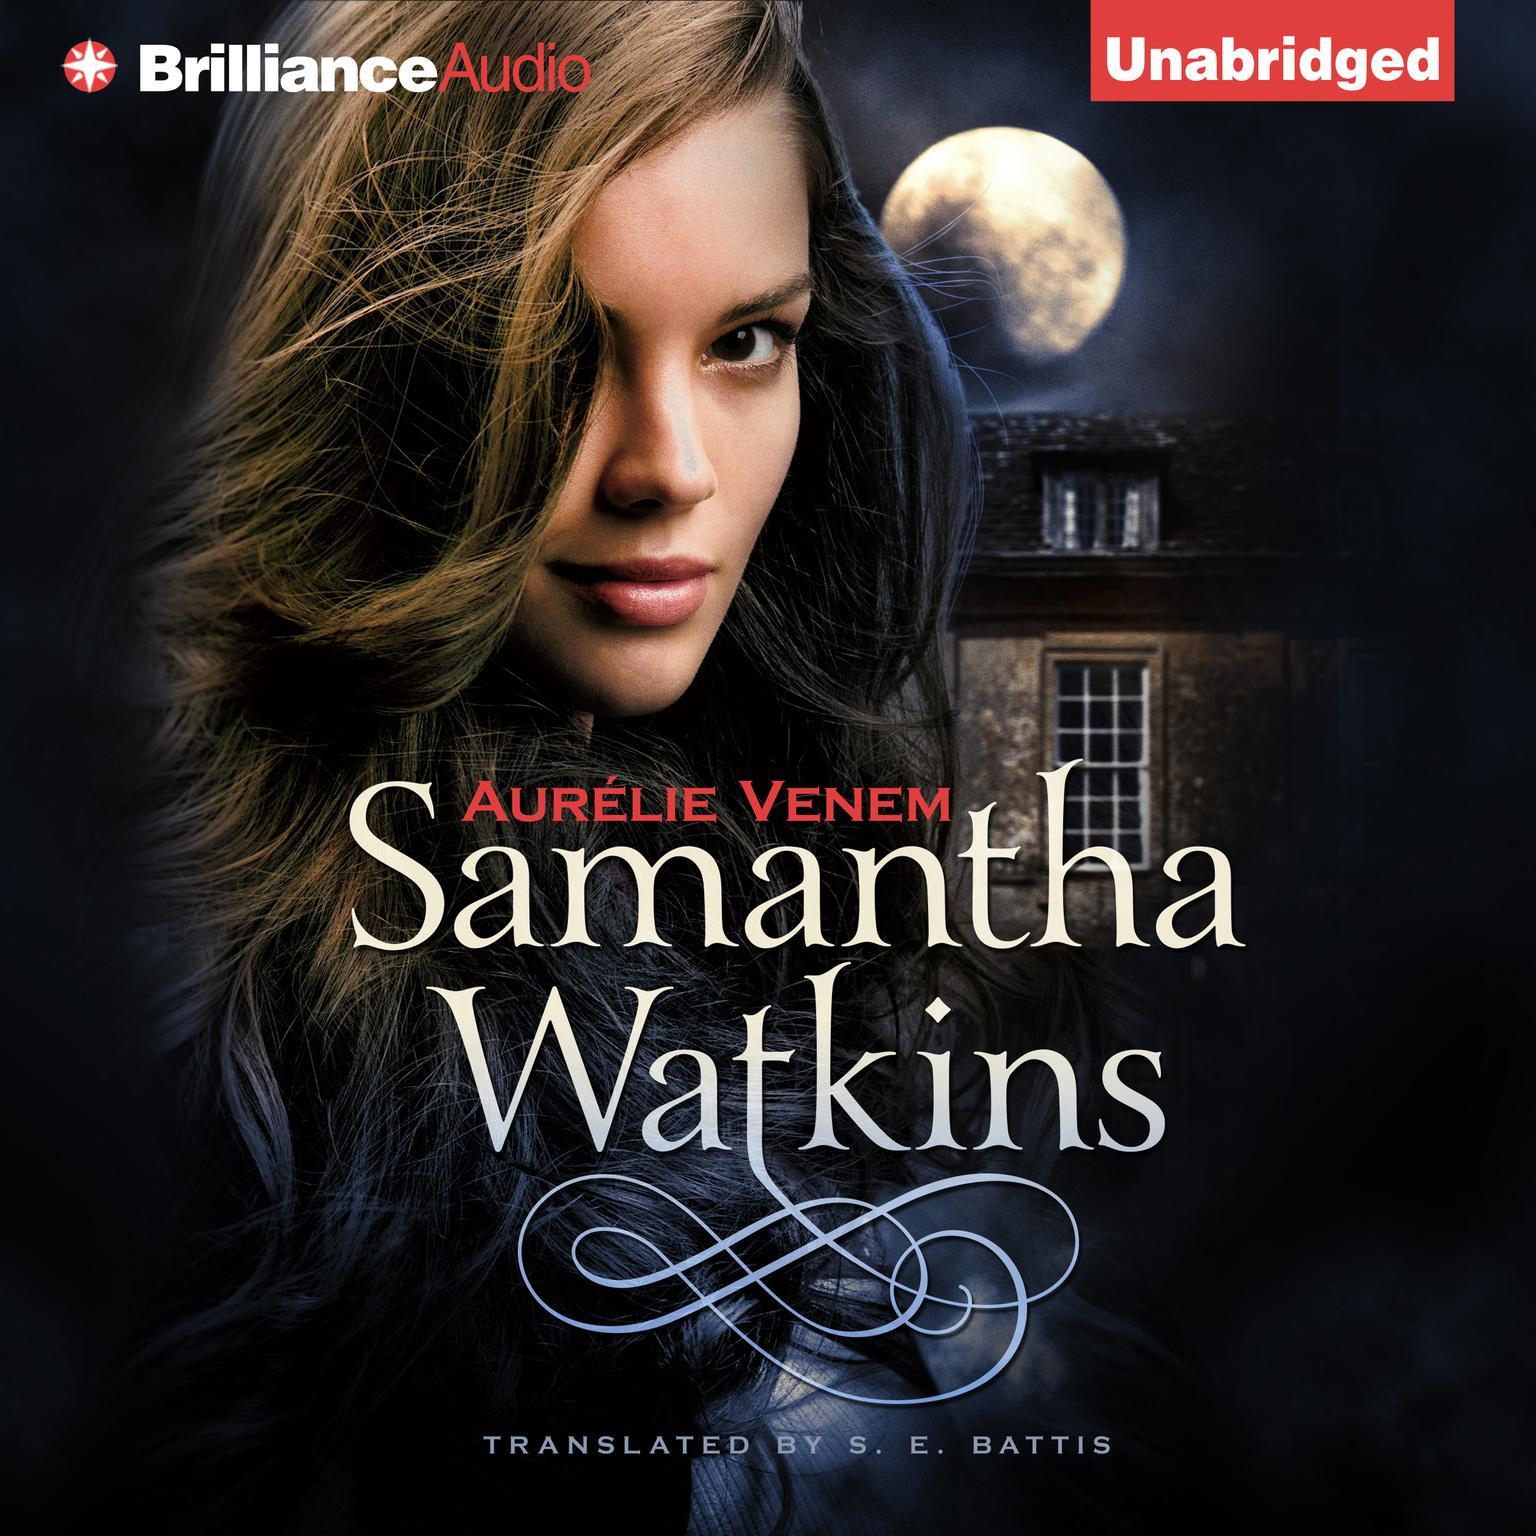 Samantha Watkins: Chronicles of an Extraordinary Ordinary Life Audiobook, by Aurélie Venem